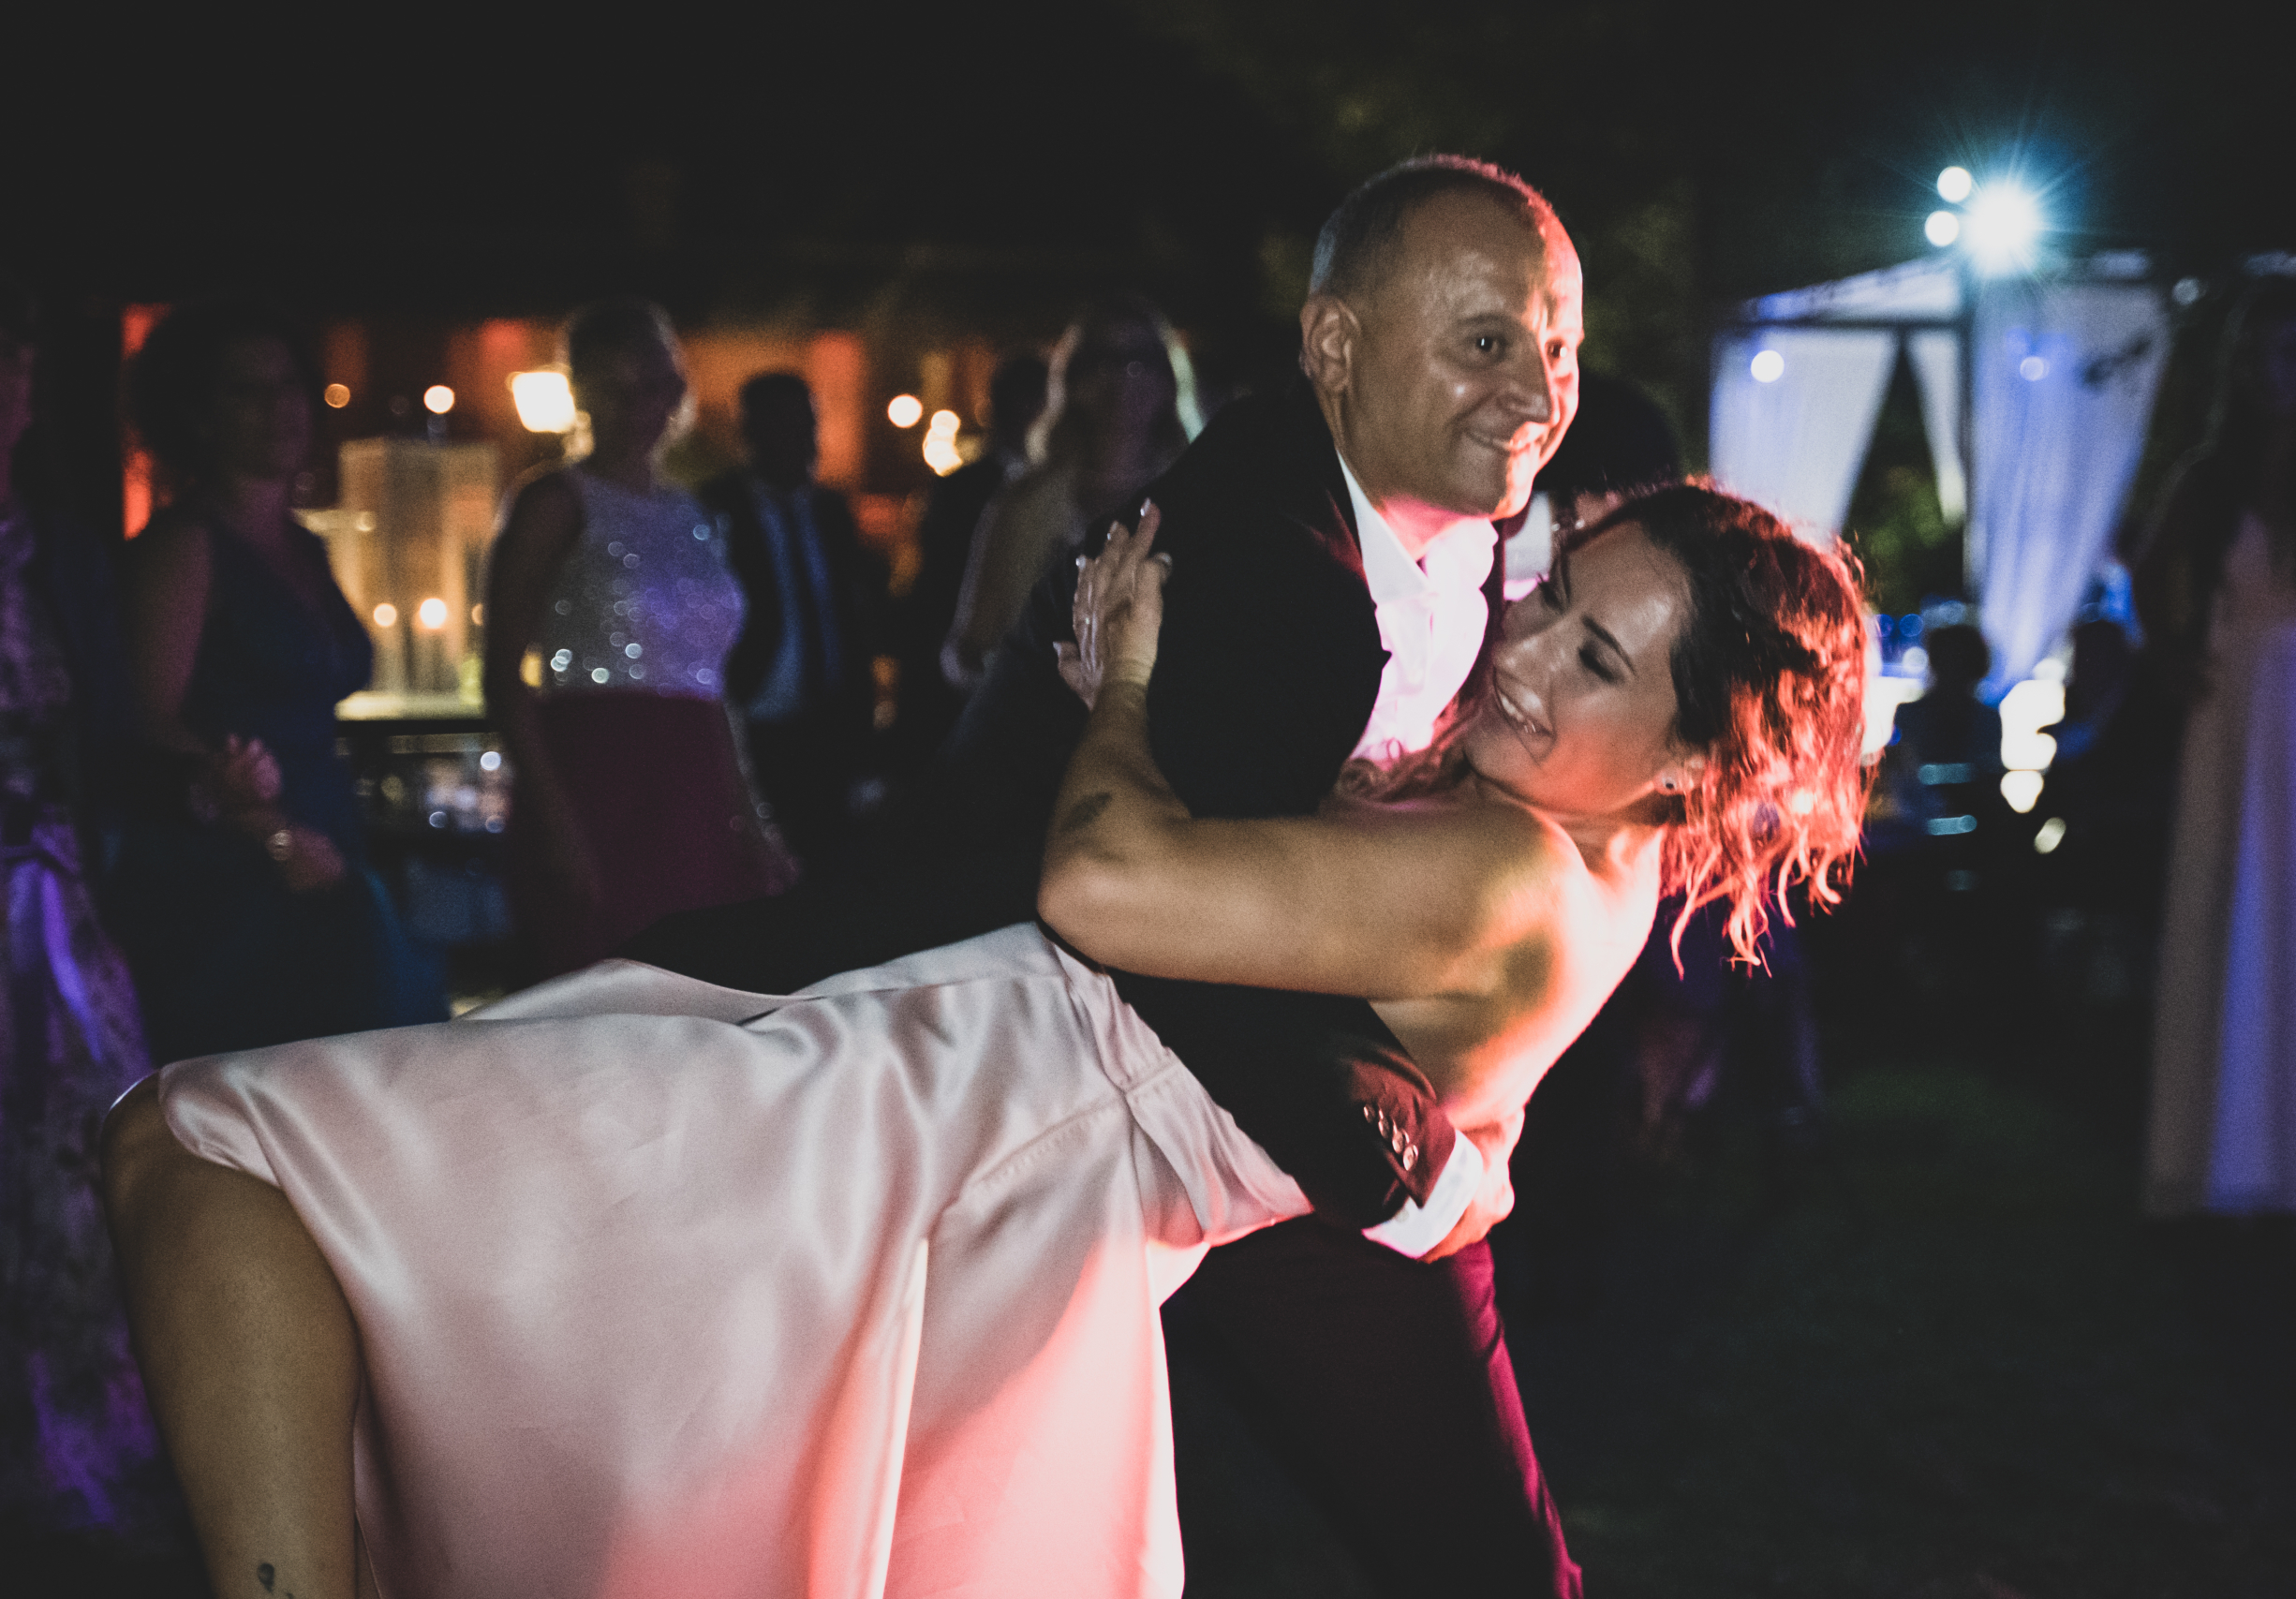 wedding, rome, luxuriwedding, borgolegrazie, maziana, bracciano, love, Friends, Cake, weddingcake, dance